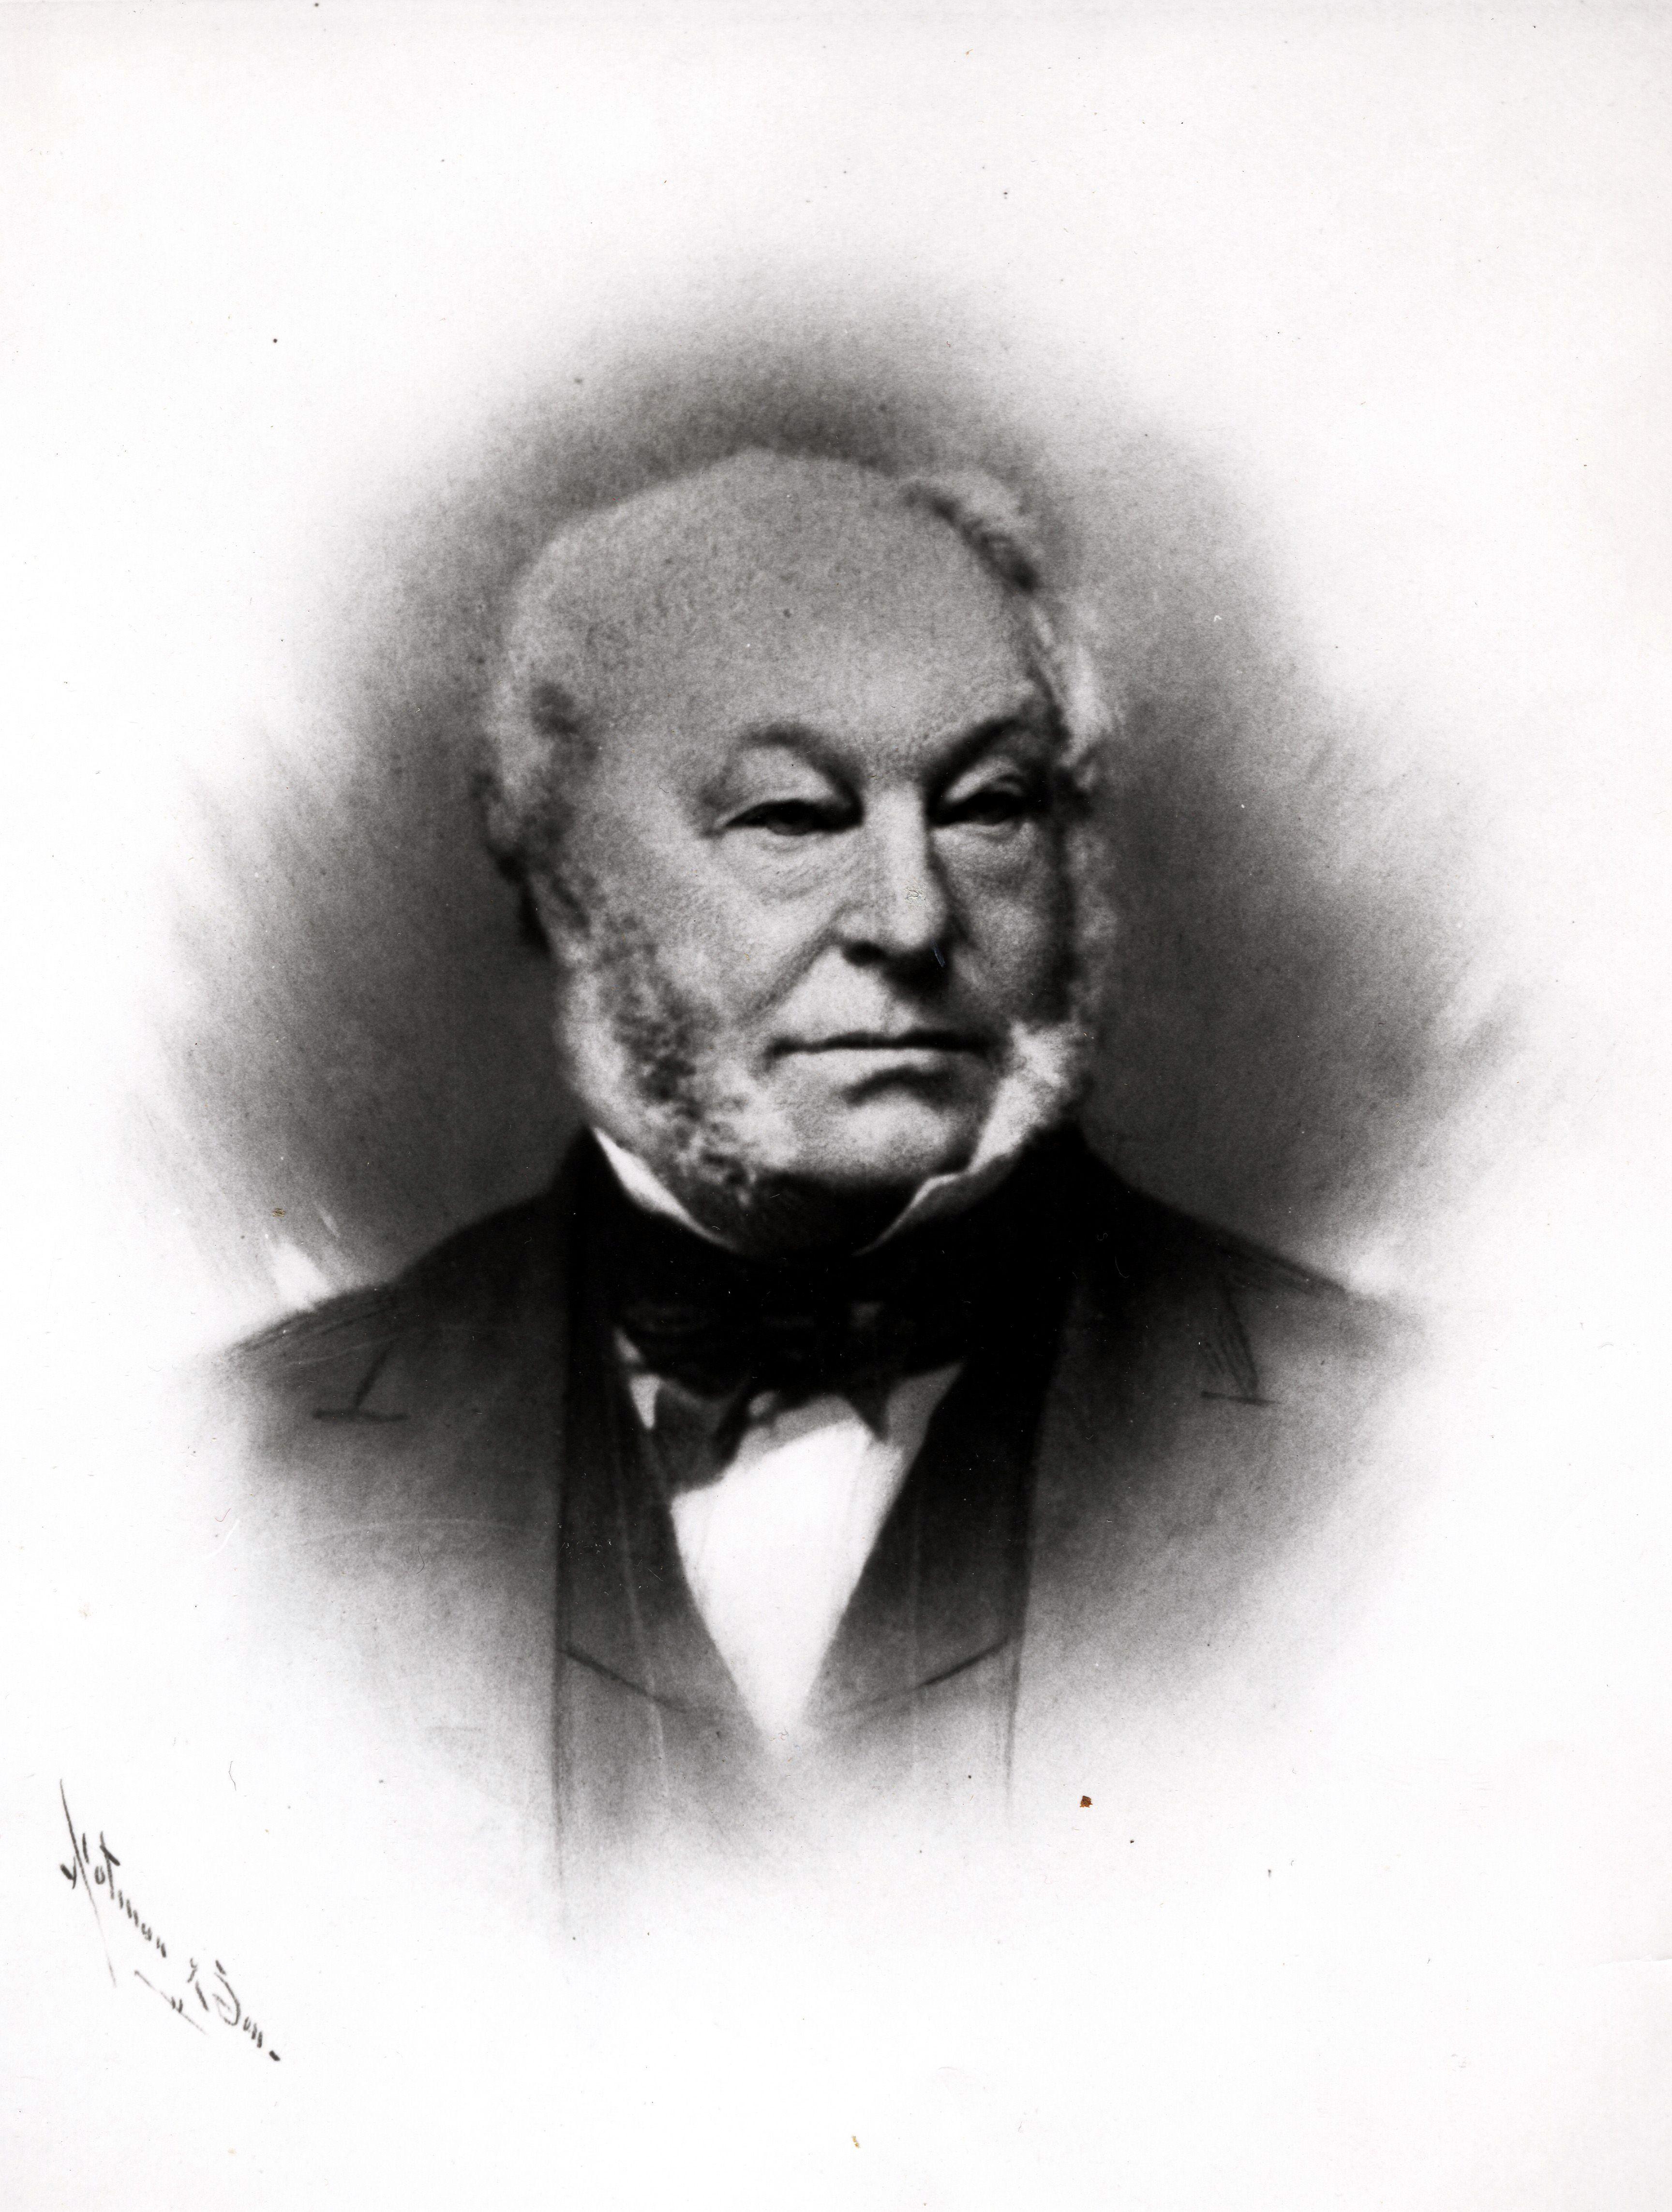 Period portrait of John Watkins